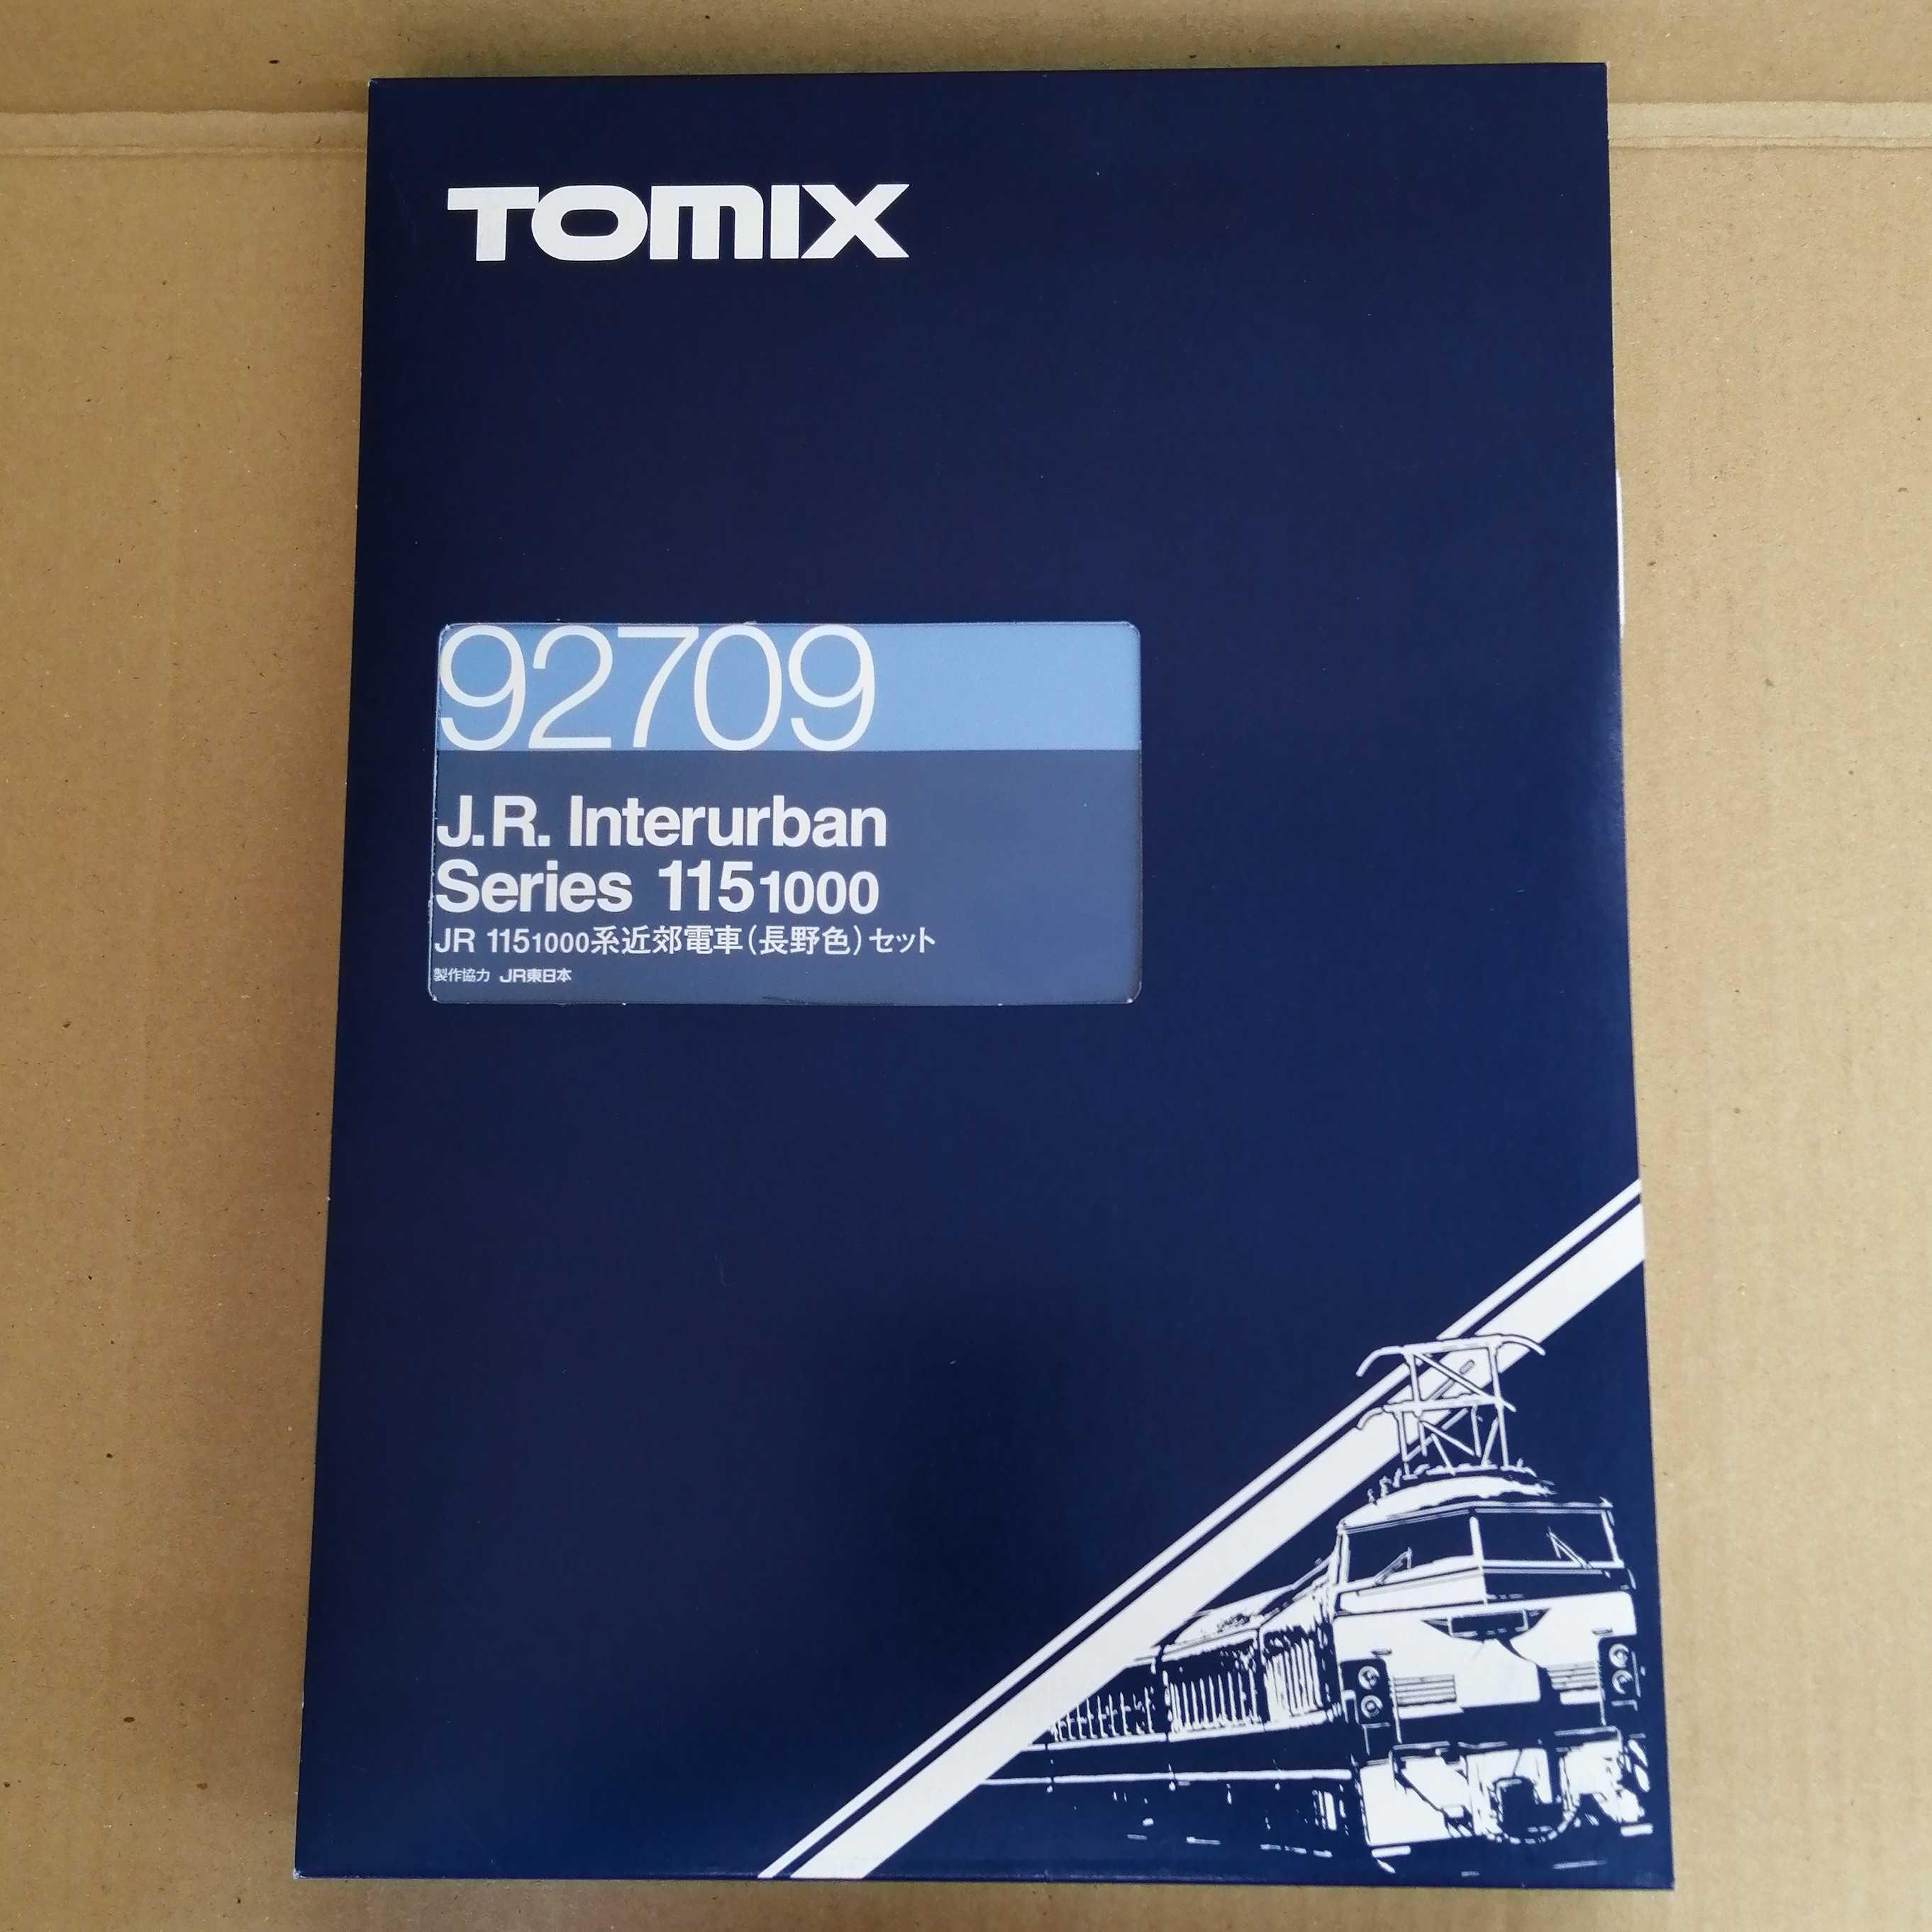 JR 115 1000系近郊電車(長野色)セット TOMIX